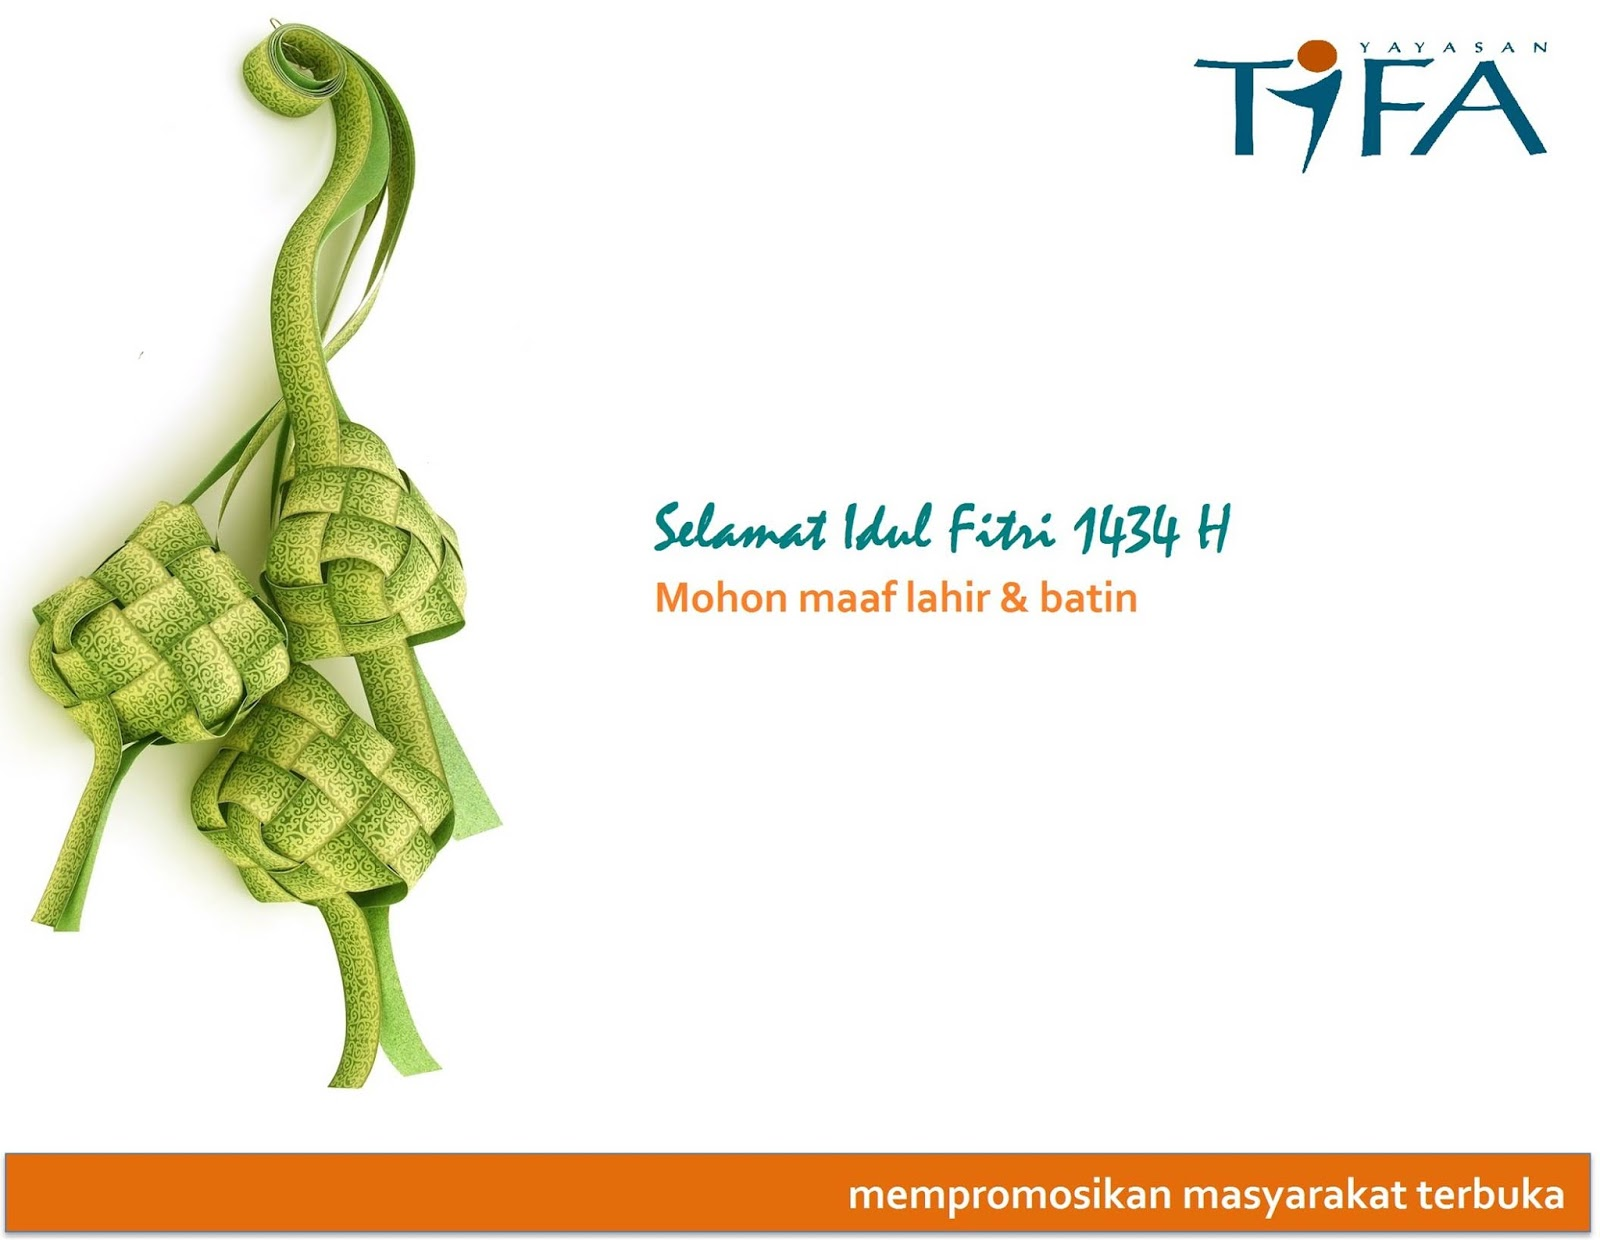 Selamat Hari Raya Idul Fitri 2015 Whatsapp Status Images